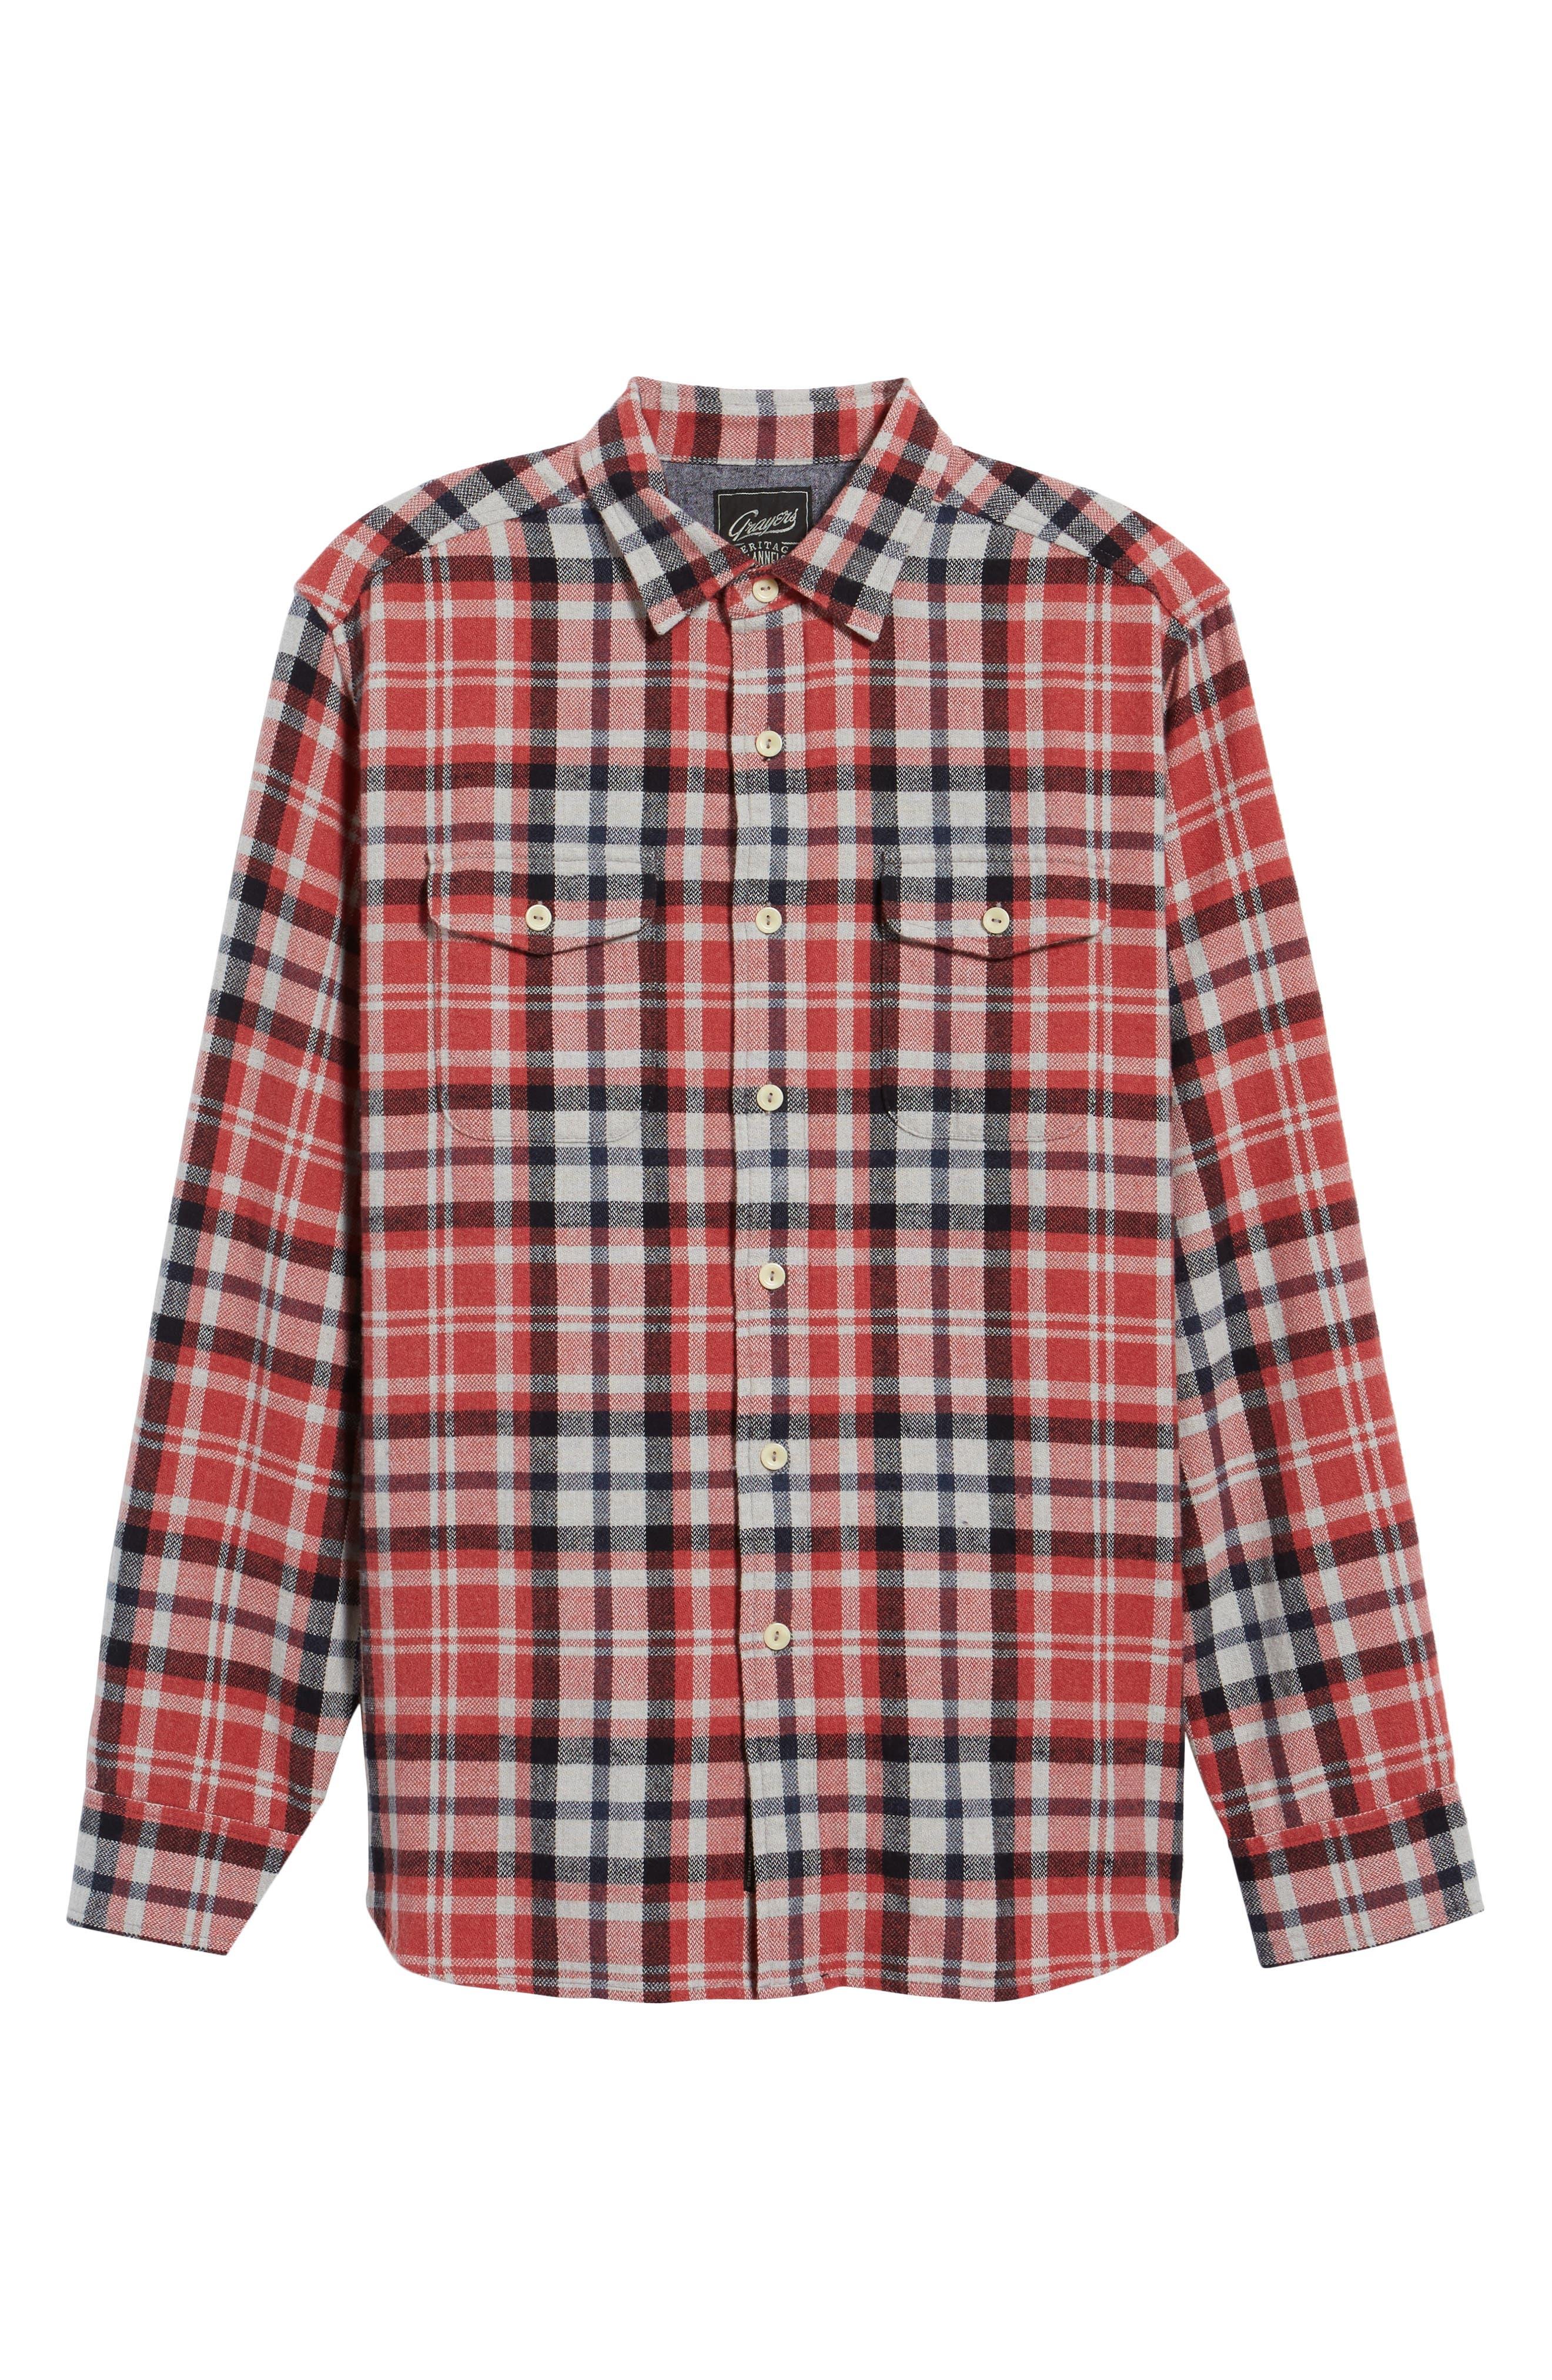 Brampton Textured Plaid Flannel Shirt,                             Alternate thumbnail 6, color,                             Red Stone Navy